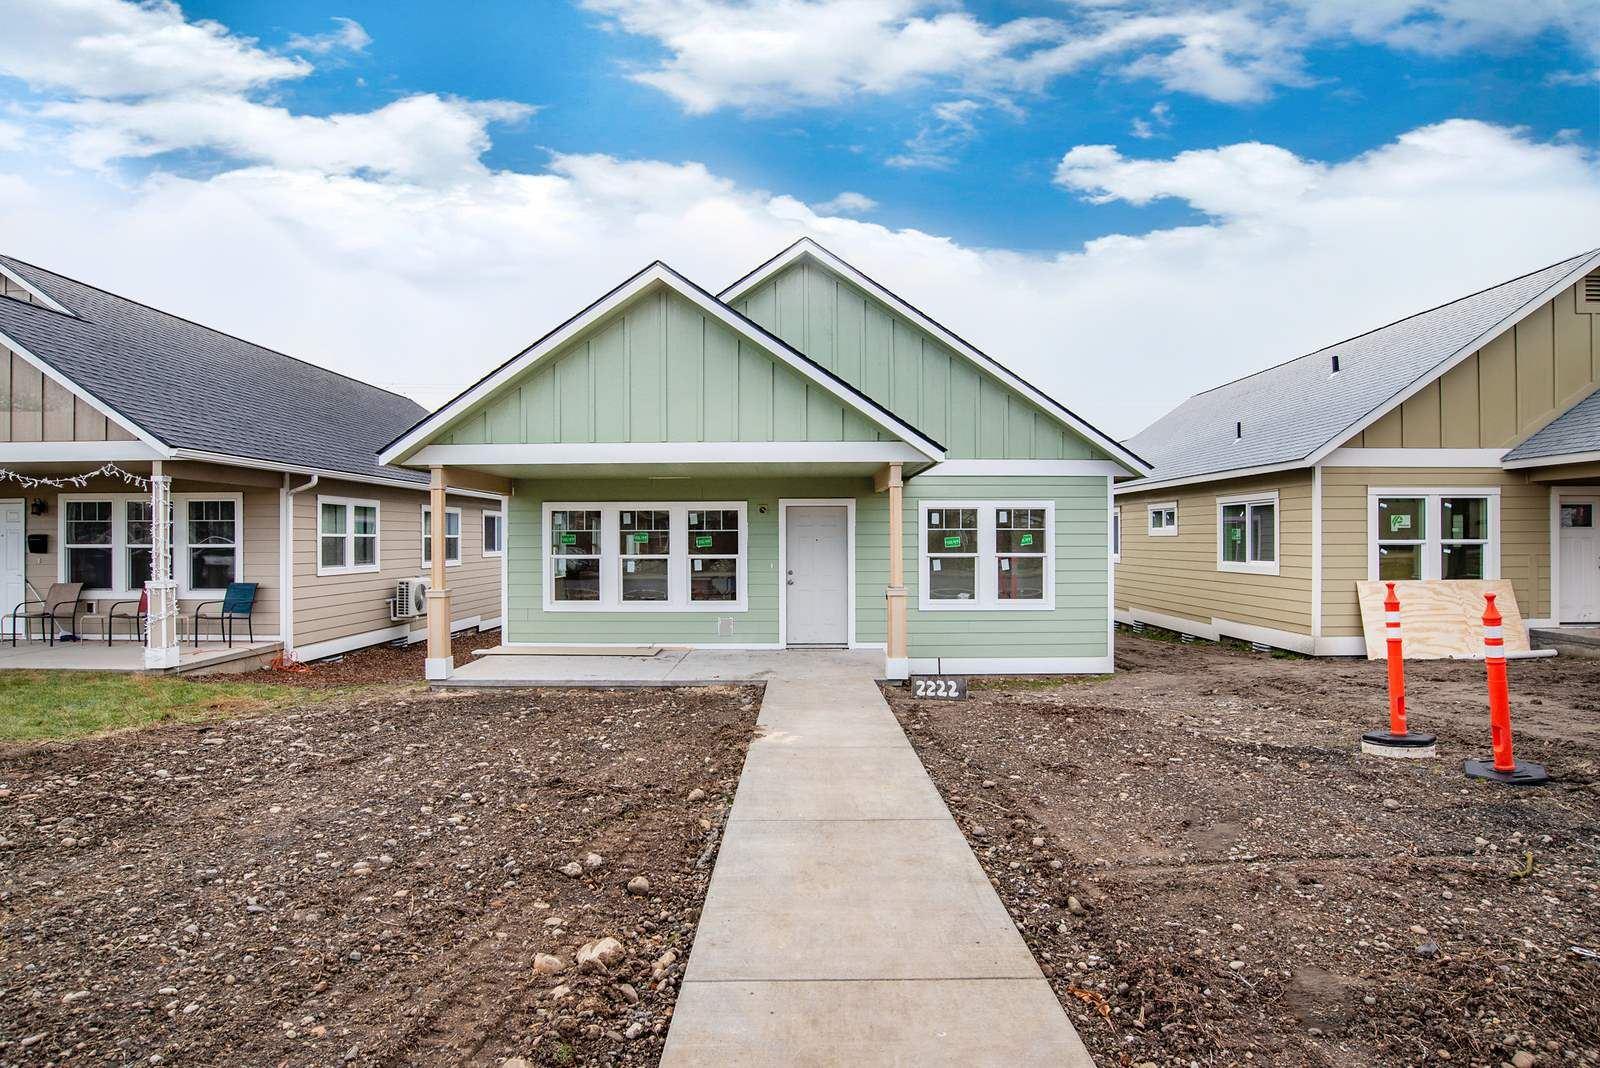 2222 E Cataldo Ave, Spokane, WA 99202 - #: 202110778